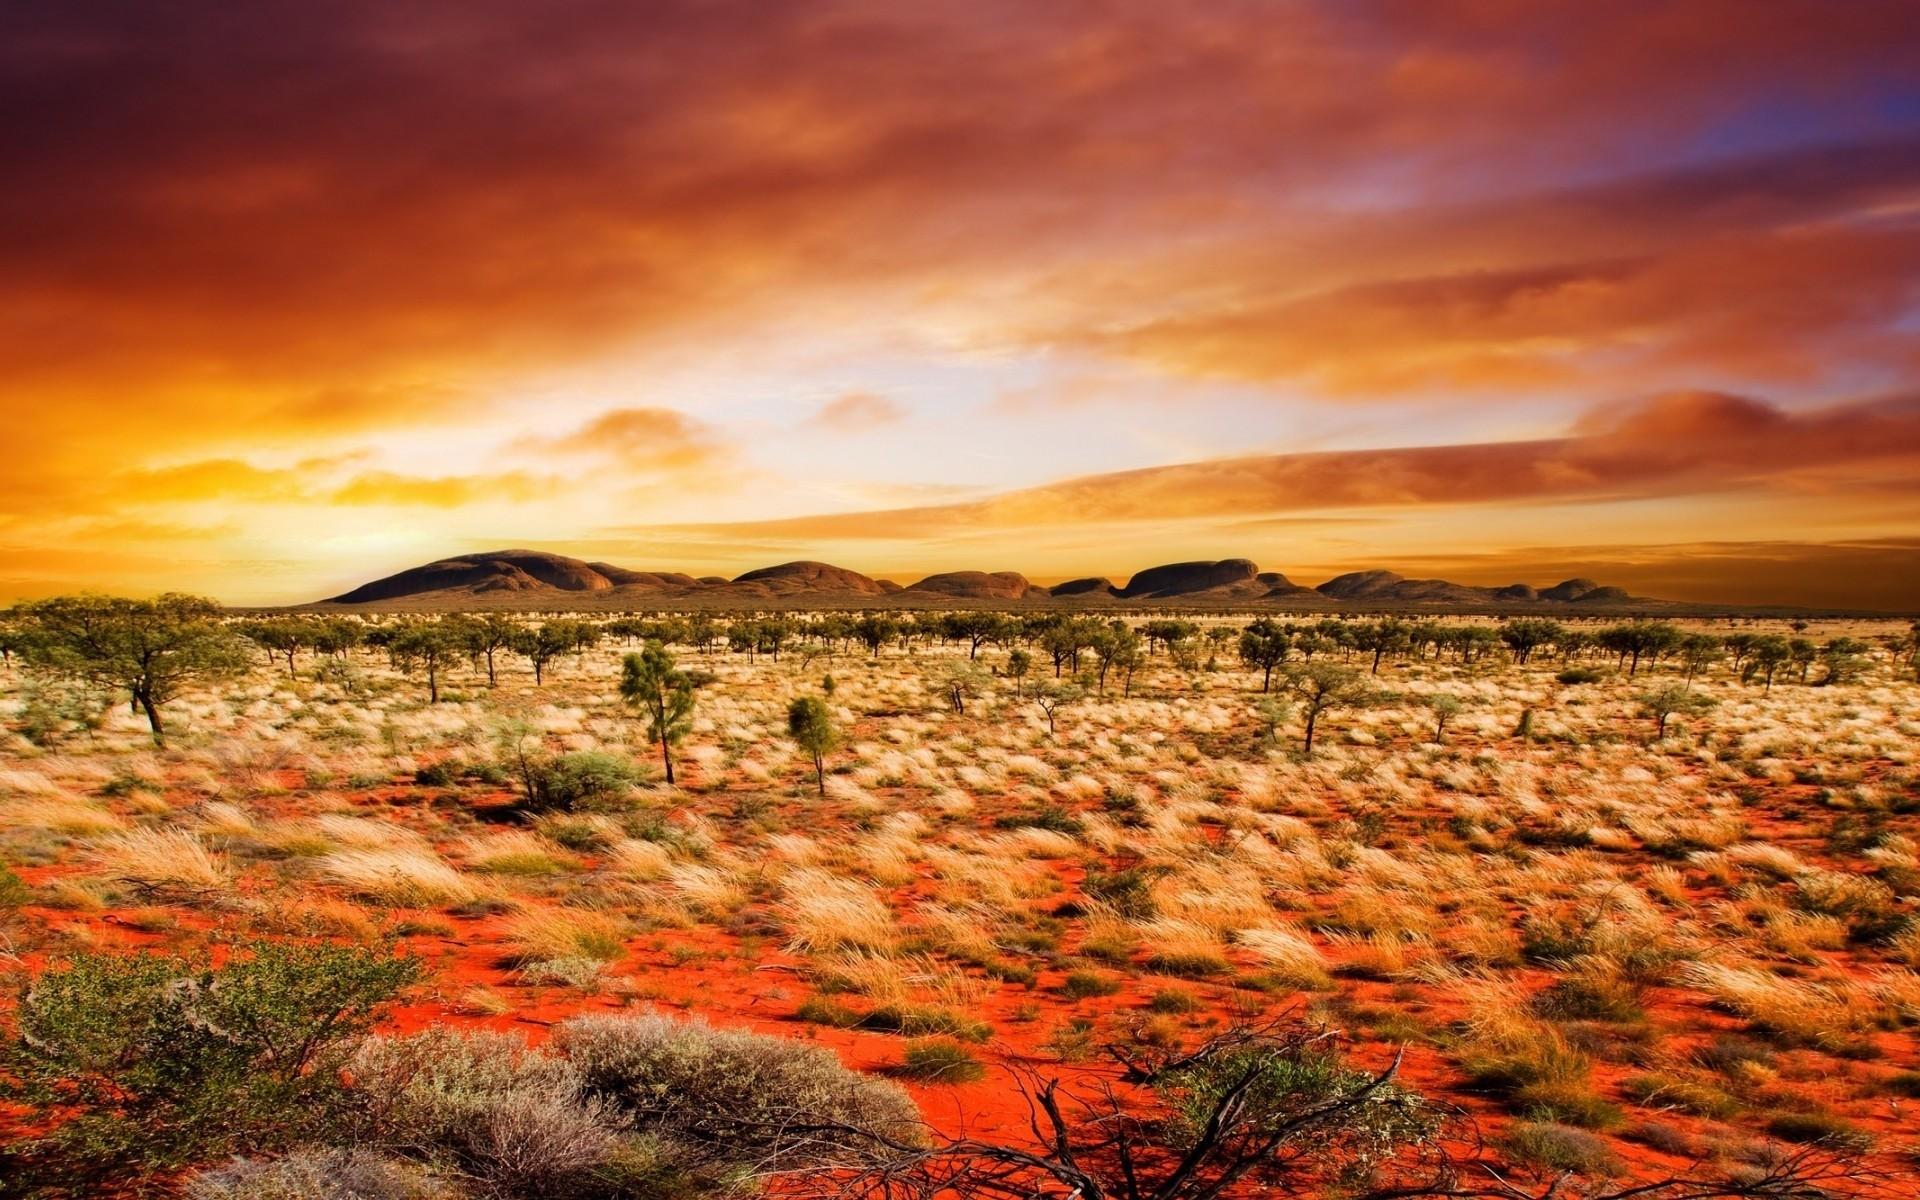 Bosque desierto al atardecer - 1920x1200